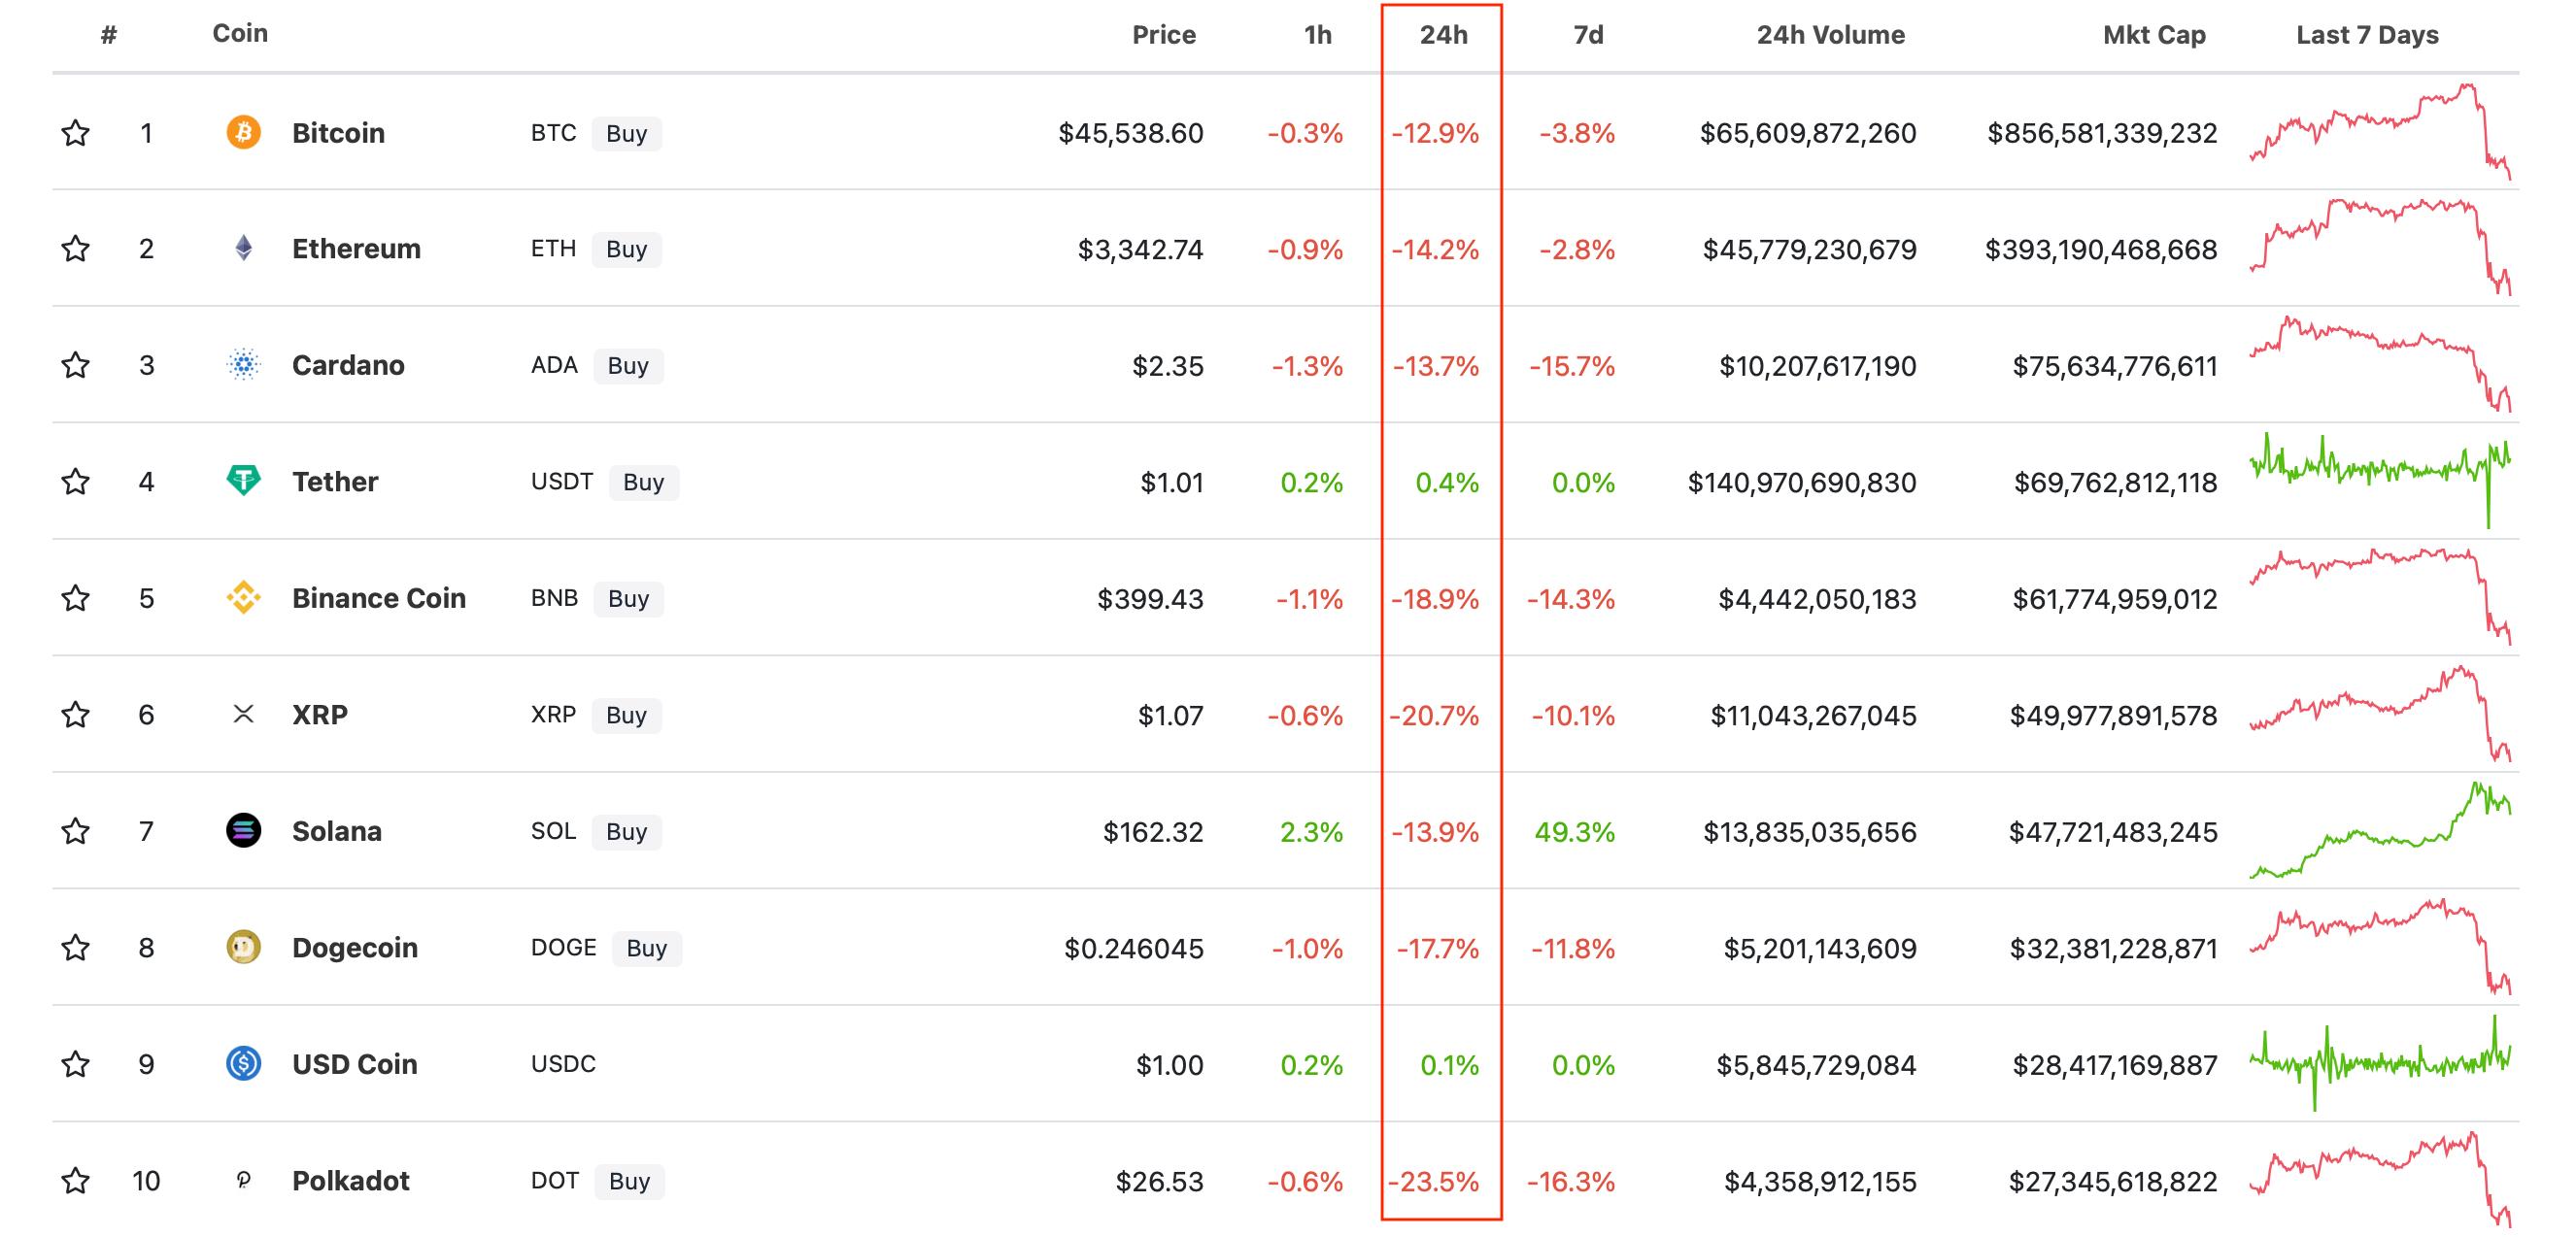 криптовалюты рейтинг курс